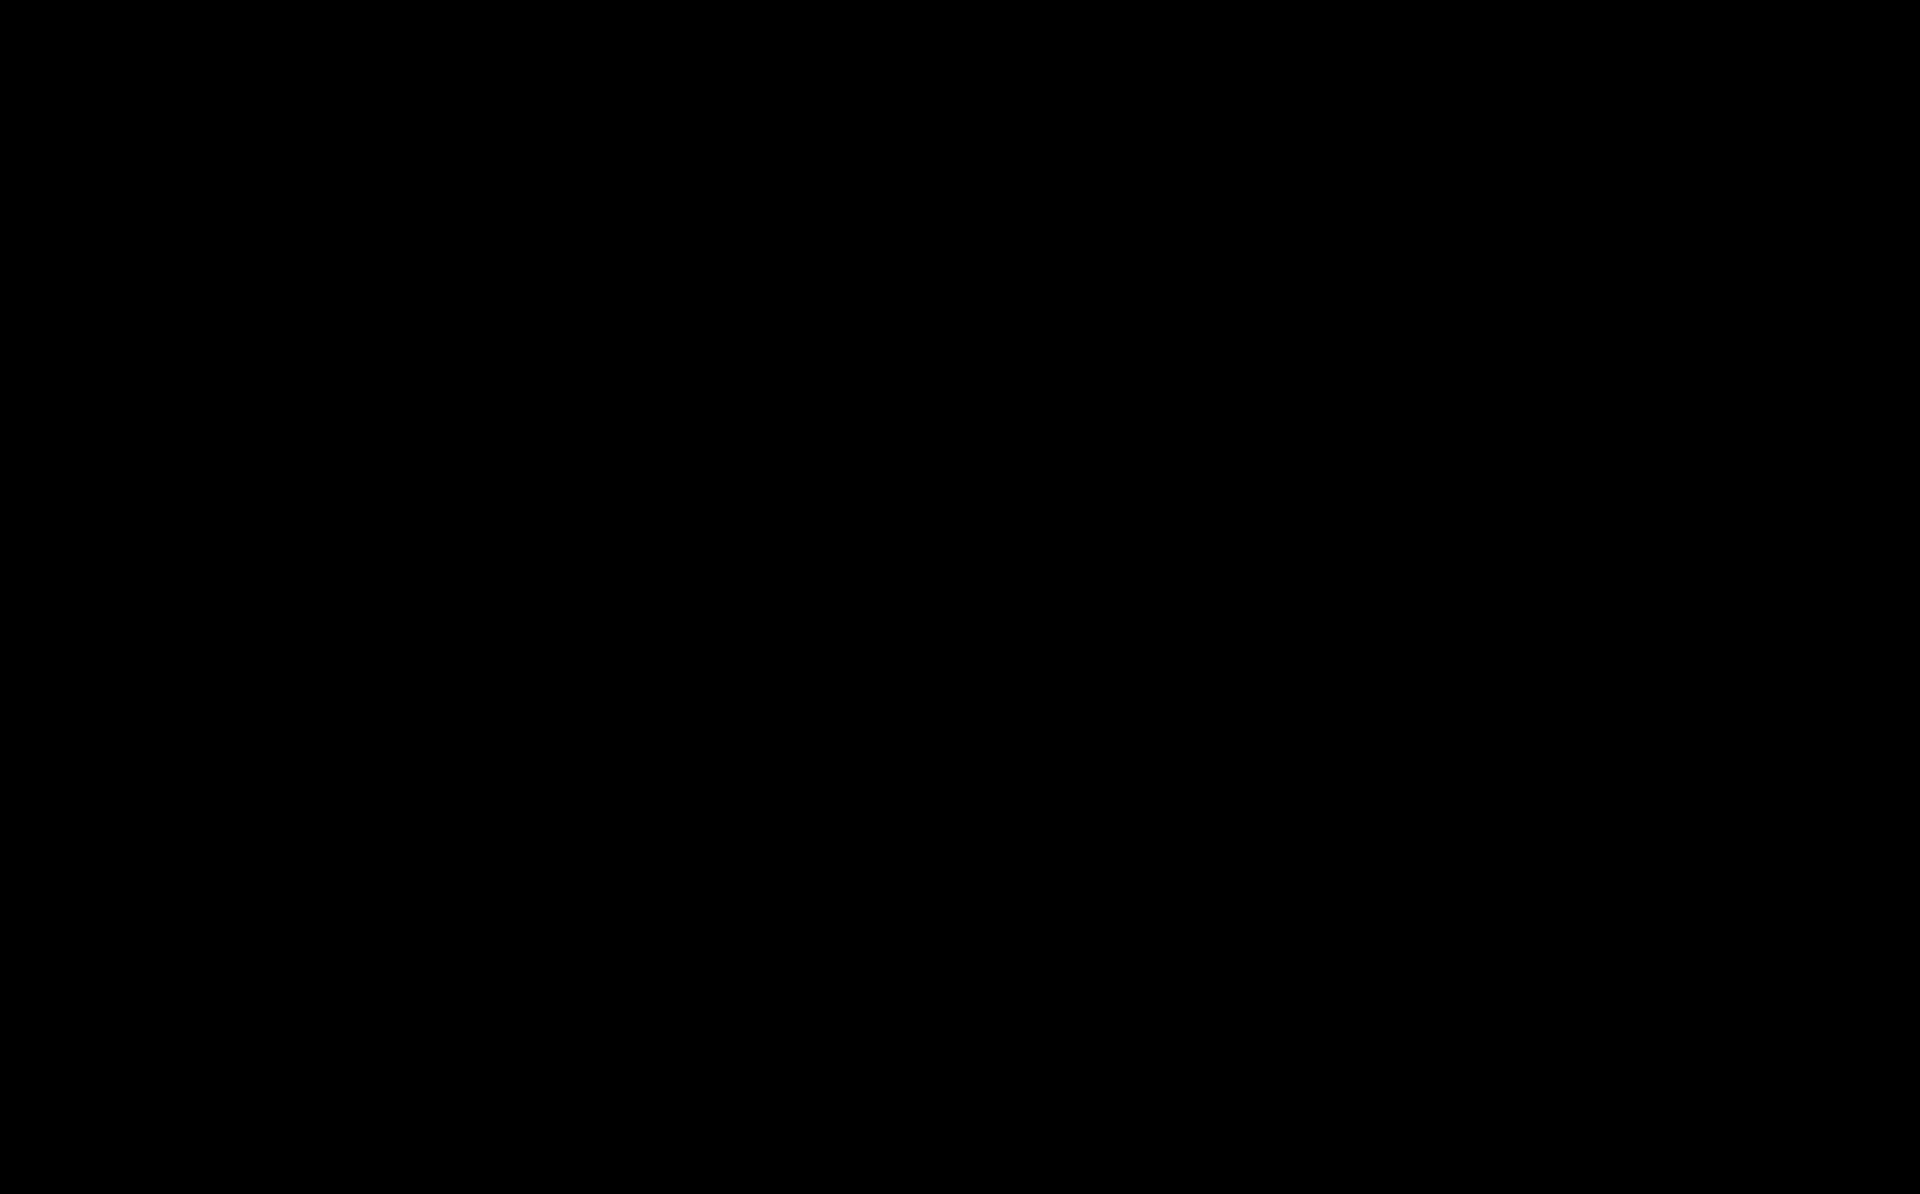 binary, random, numbers to represent DDoS